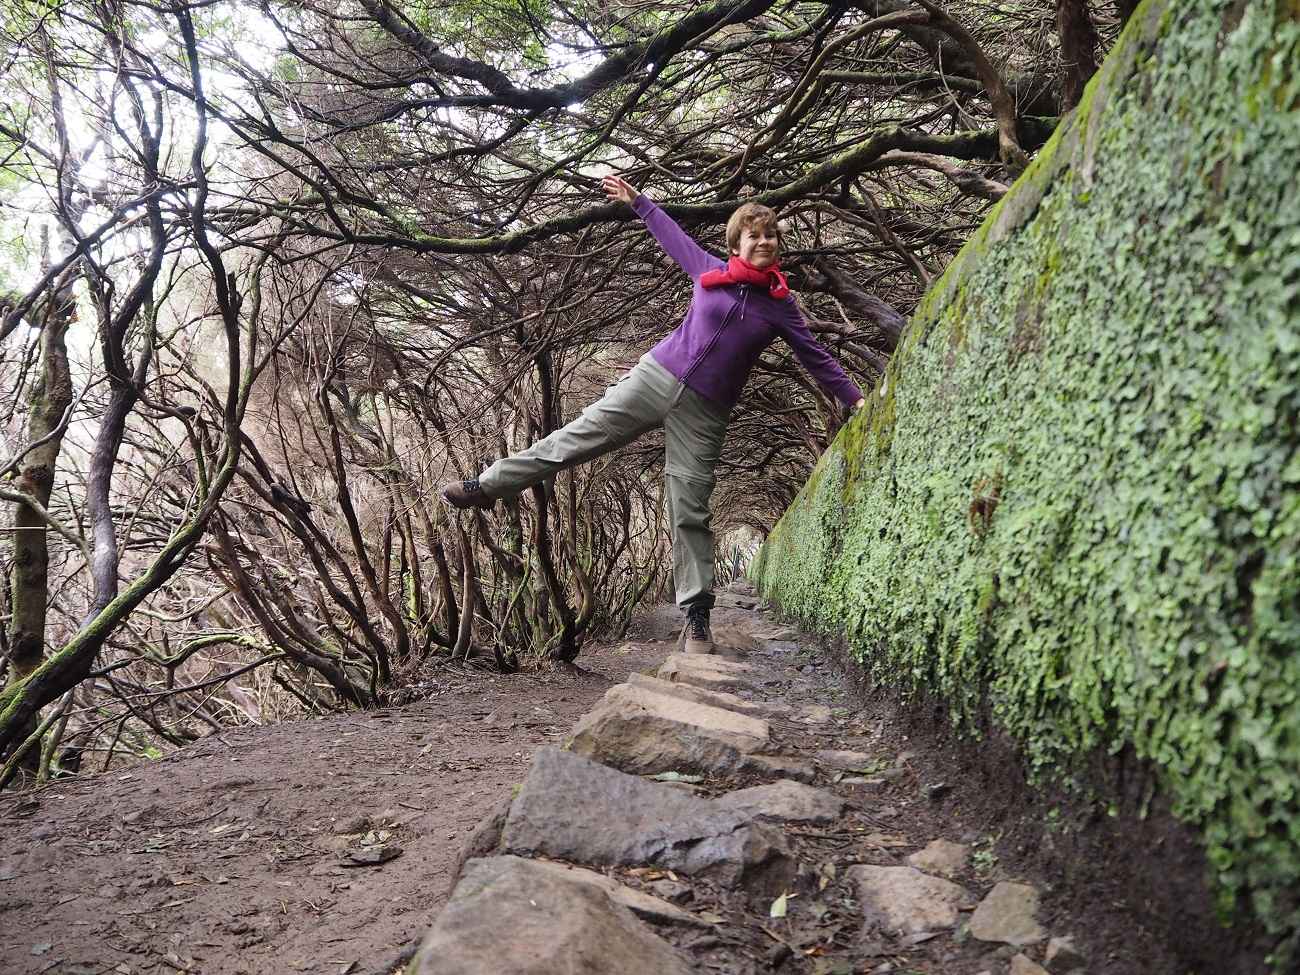 5. kép: Madeira